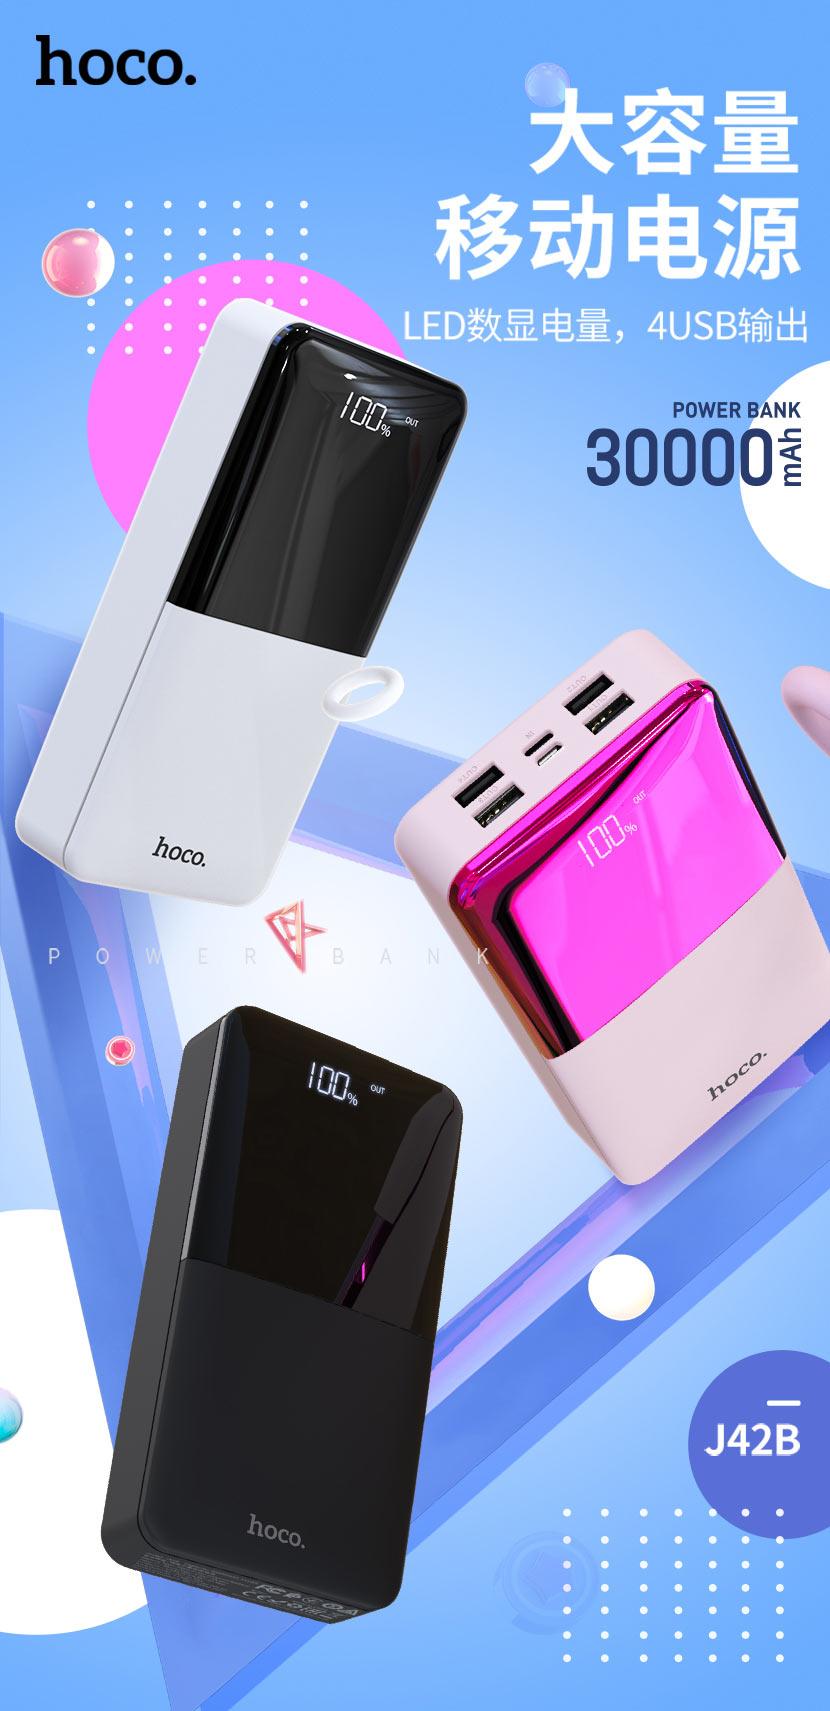 hoco news j42b high power mobile power bank 30000mah cn